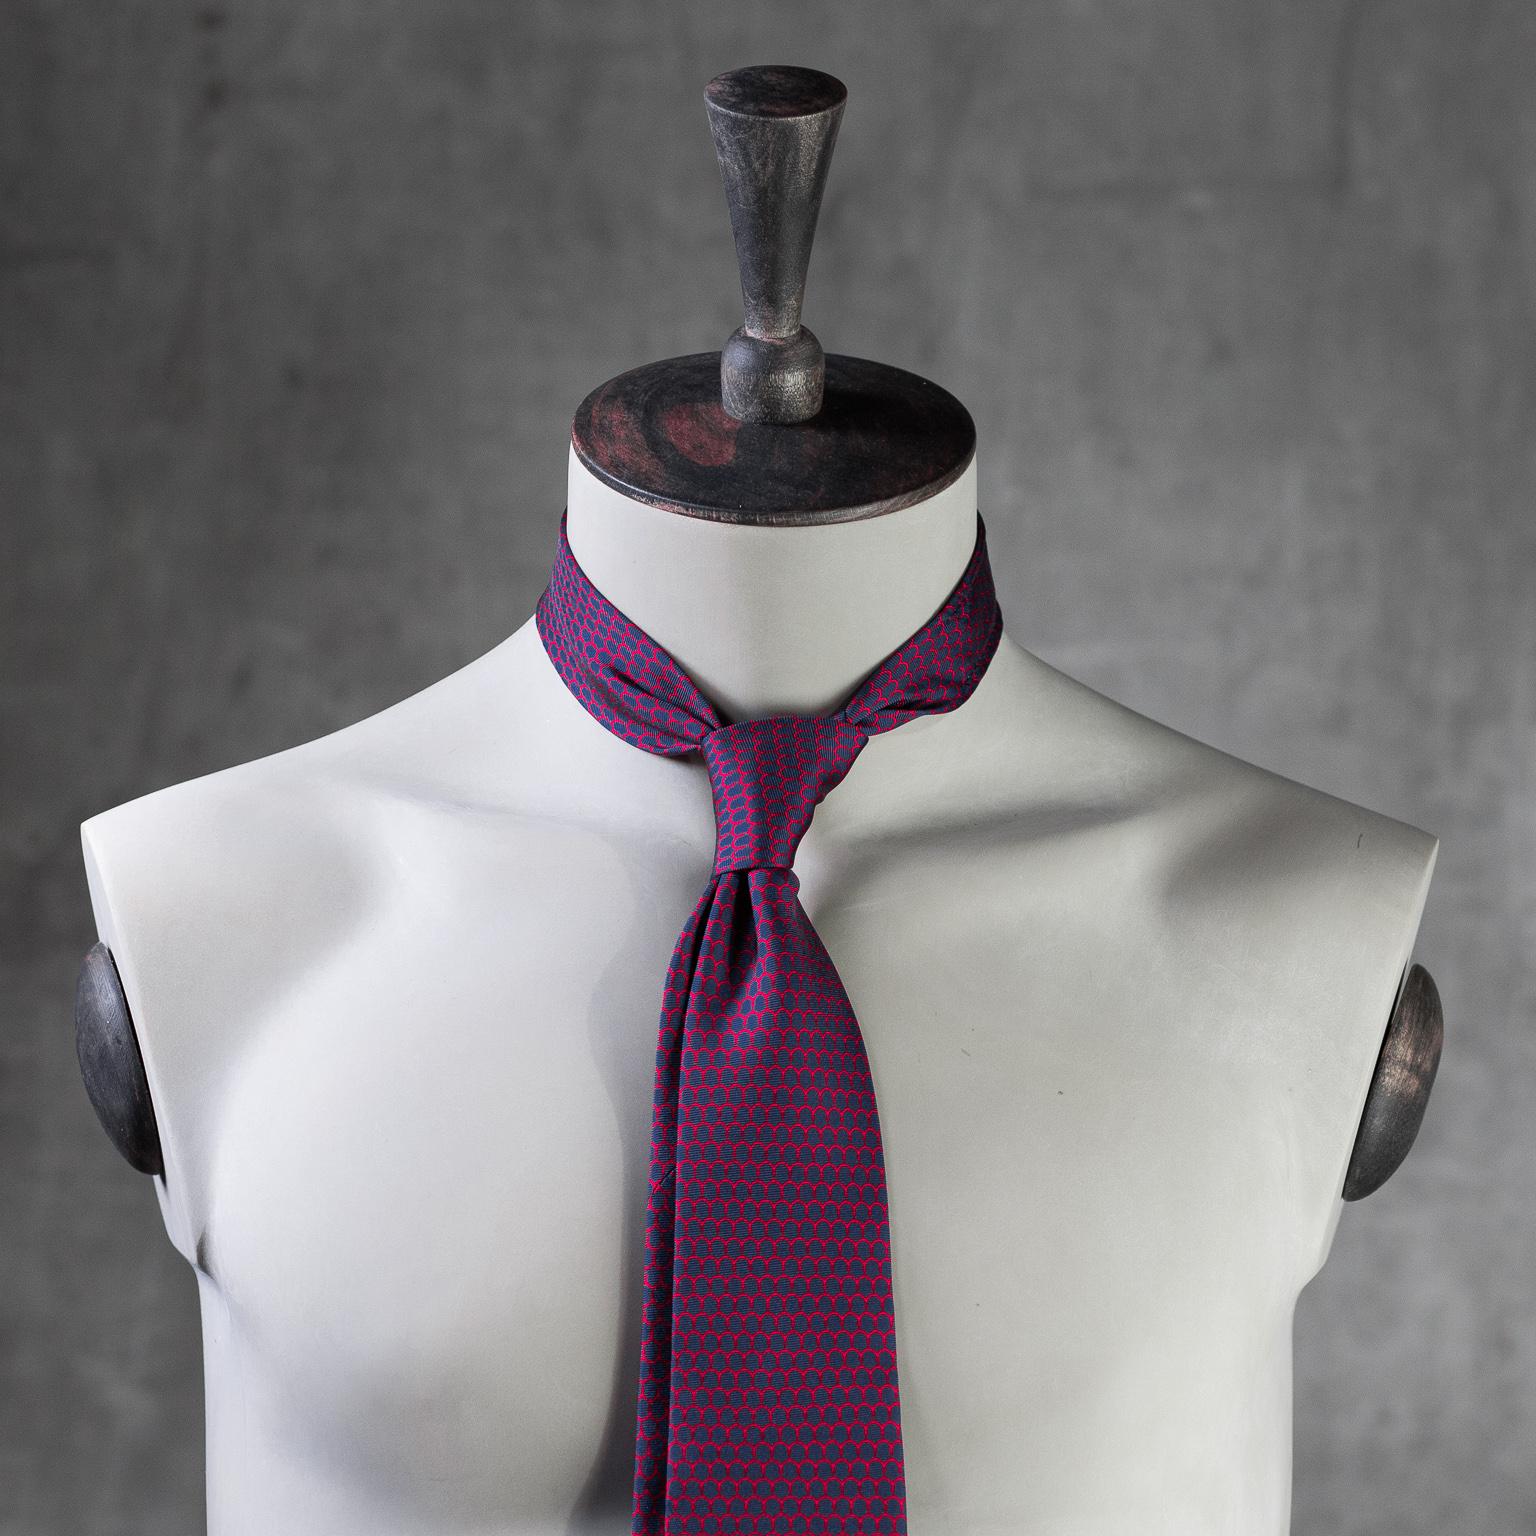 PRINTED-SILK-SEDA-ESTAMPADA-0573-Tie-Initials-Corbata-Iniciales-The-Seëlk-2